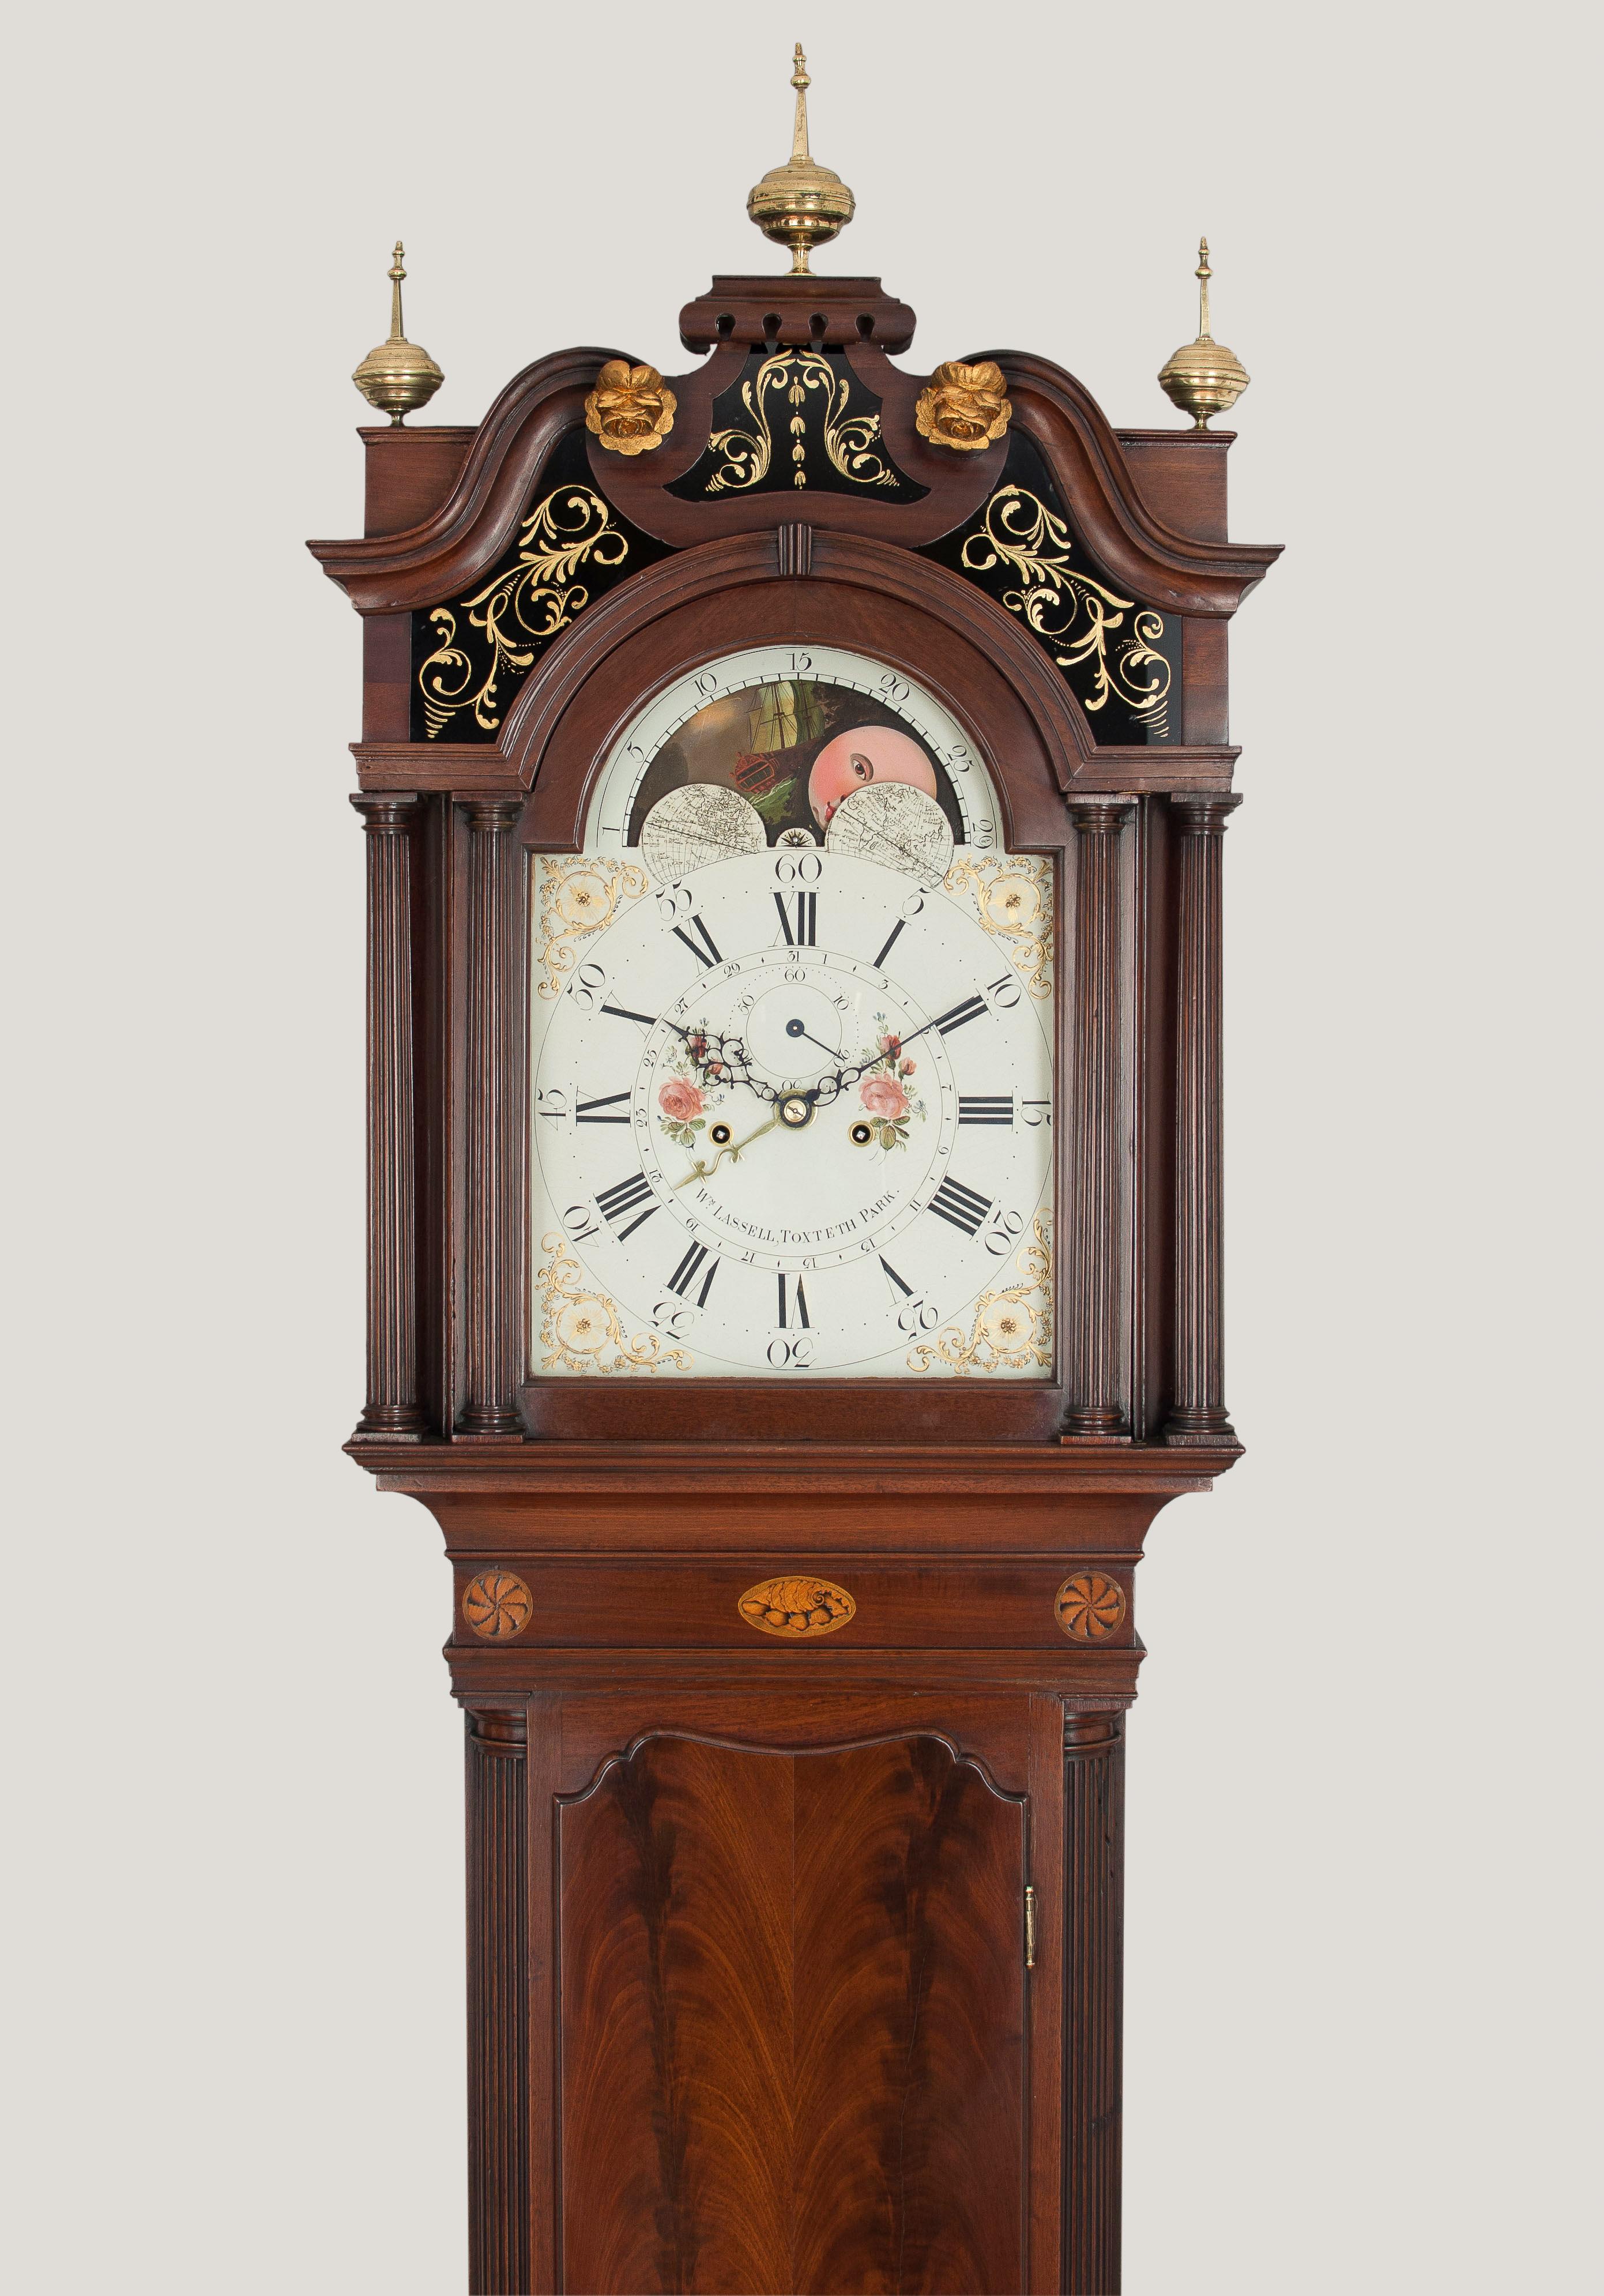 Story Antique Clocks image (5 of 11)